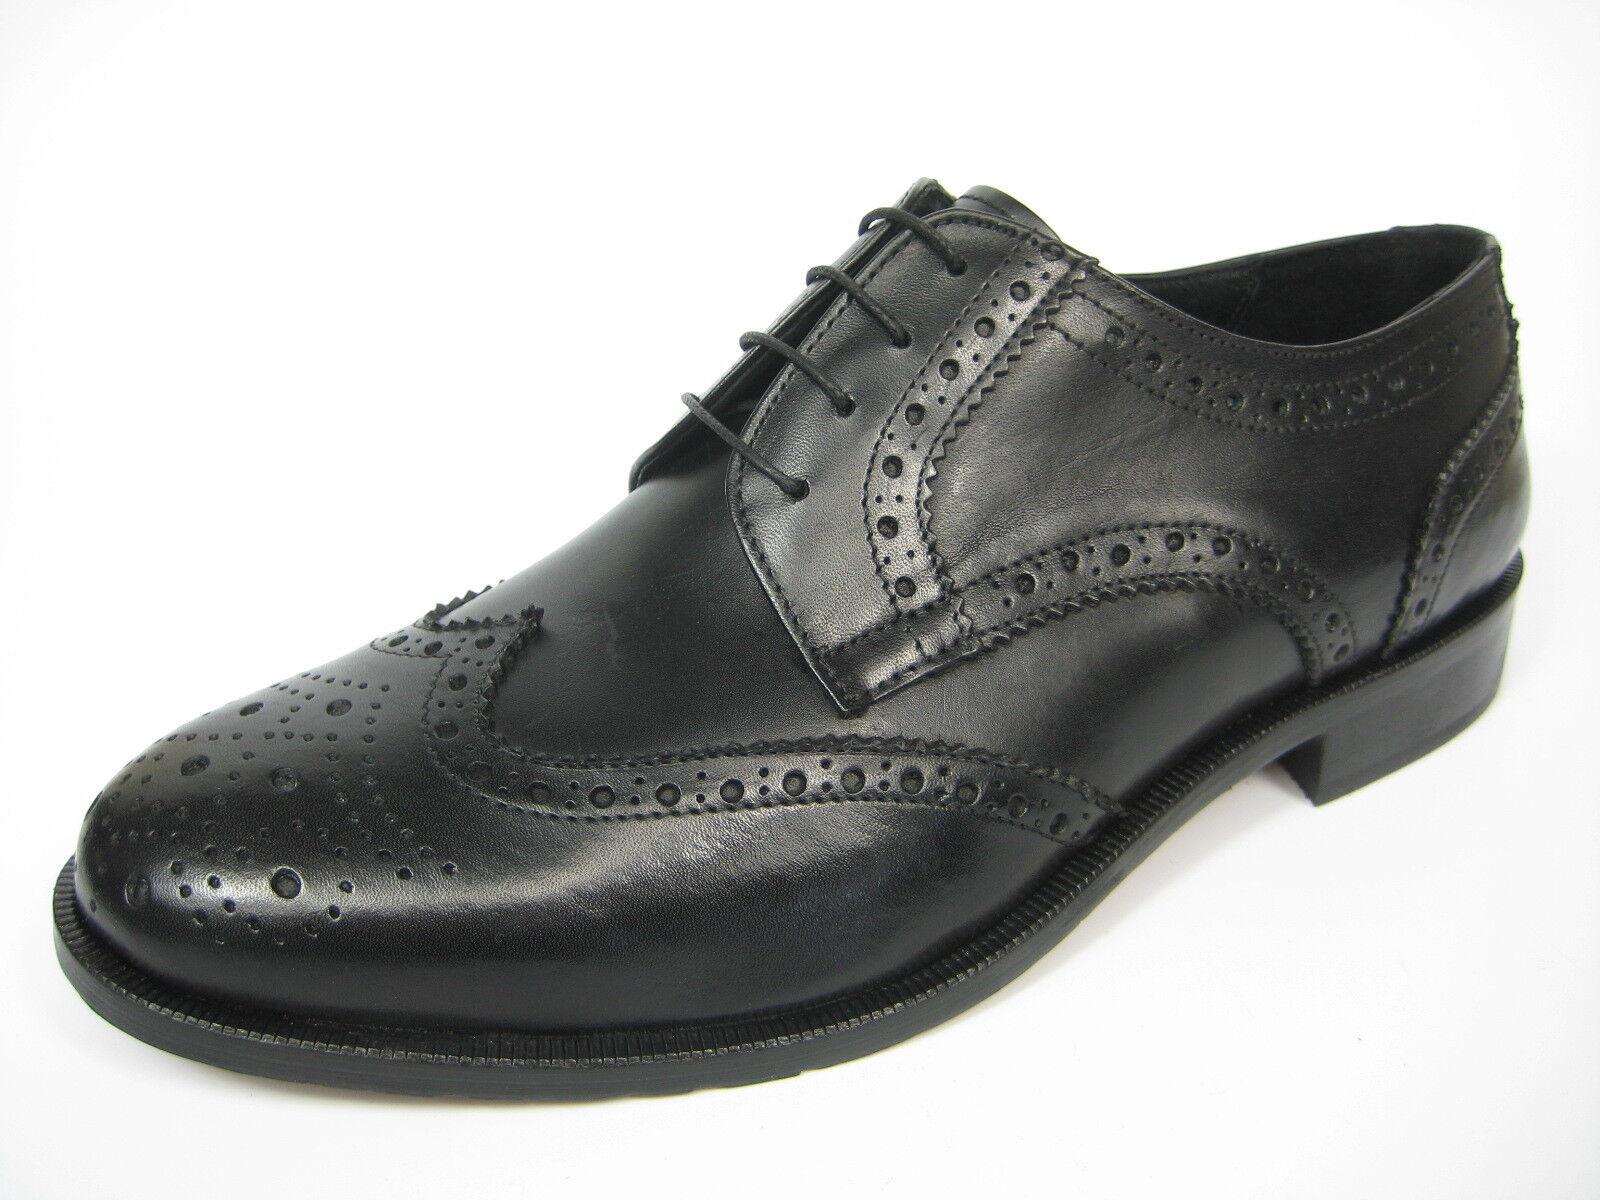 GIORGIO SCARPE 1395 Derby Budapester Leder Schuh Ledersohle schwarz/dunkel braun